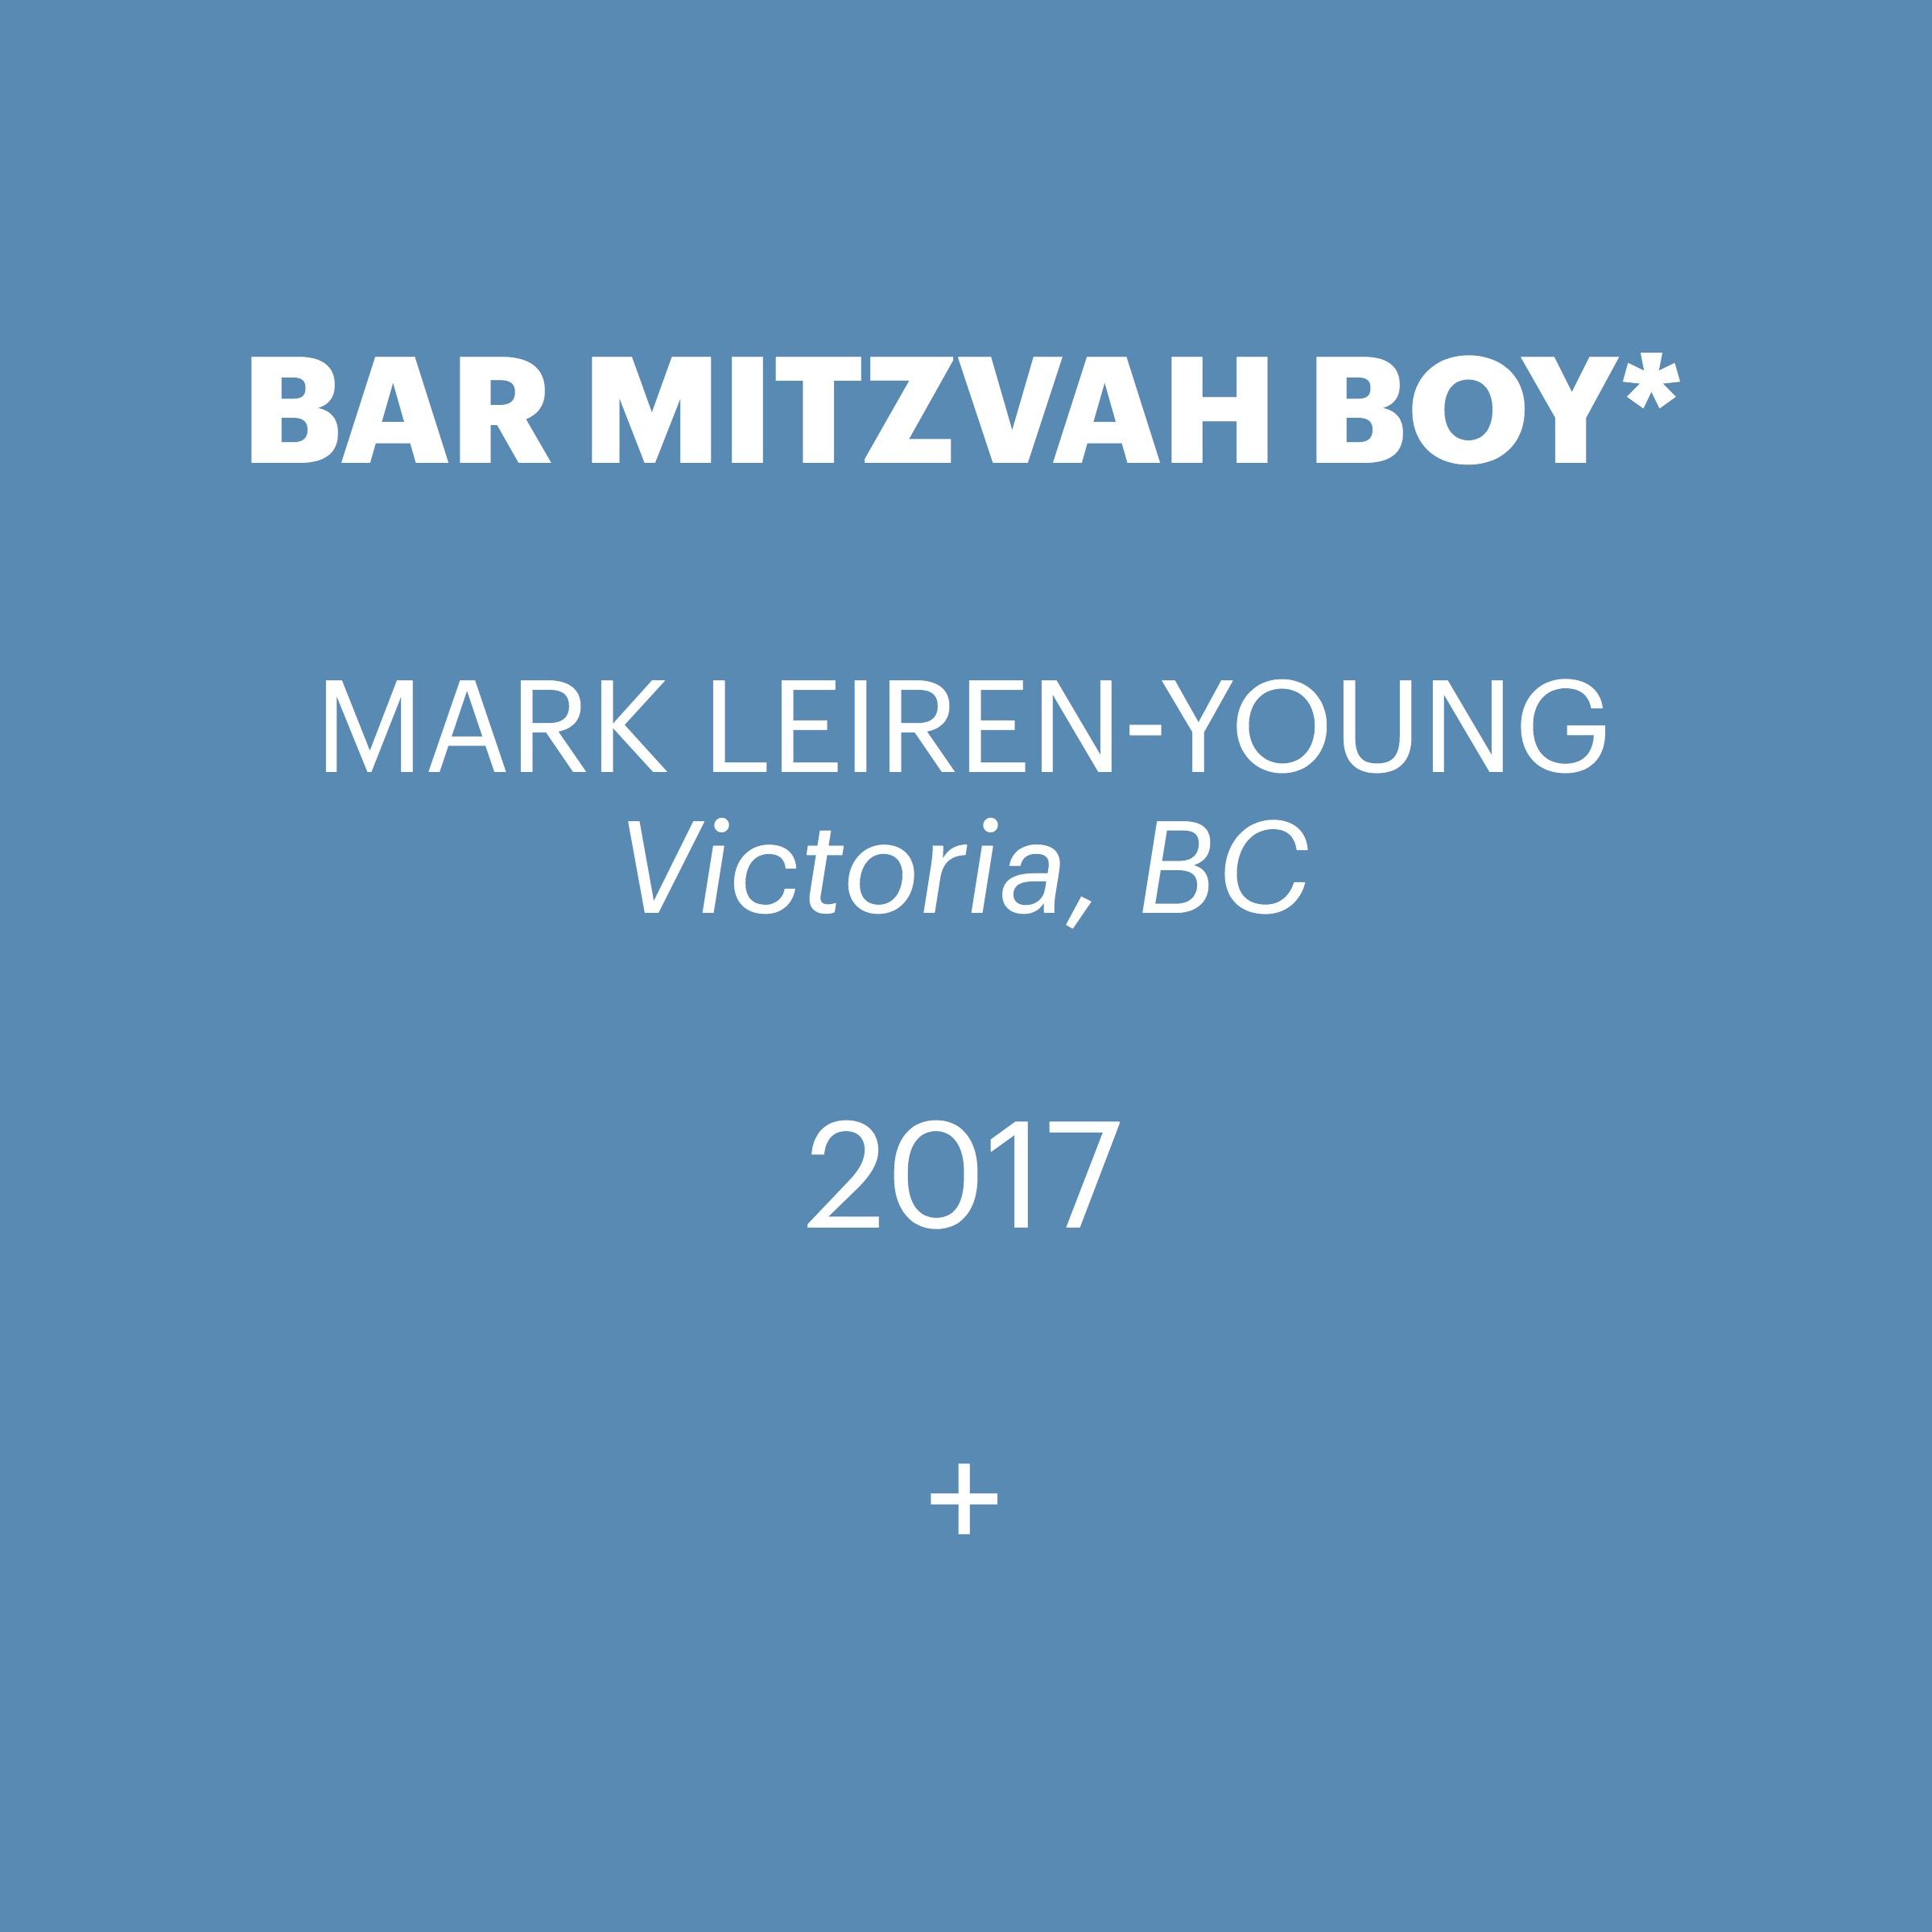 Bar Mitzvah Boy Title.jpg